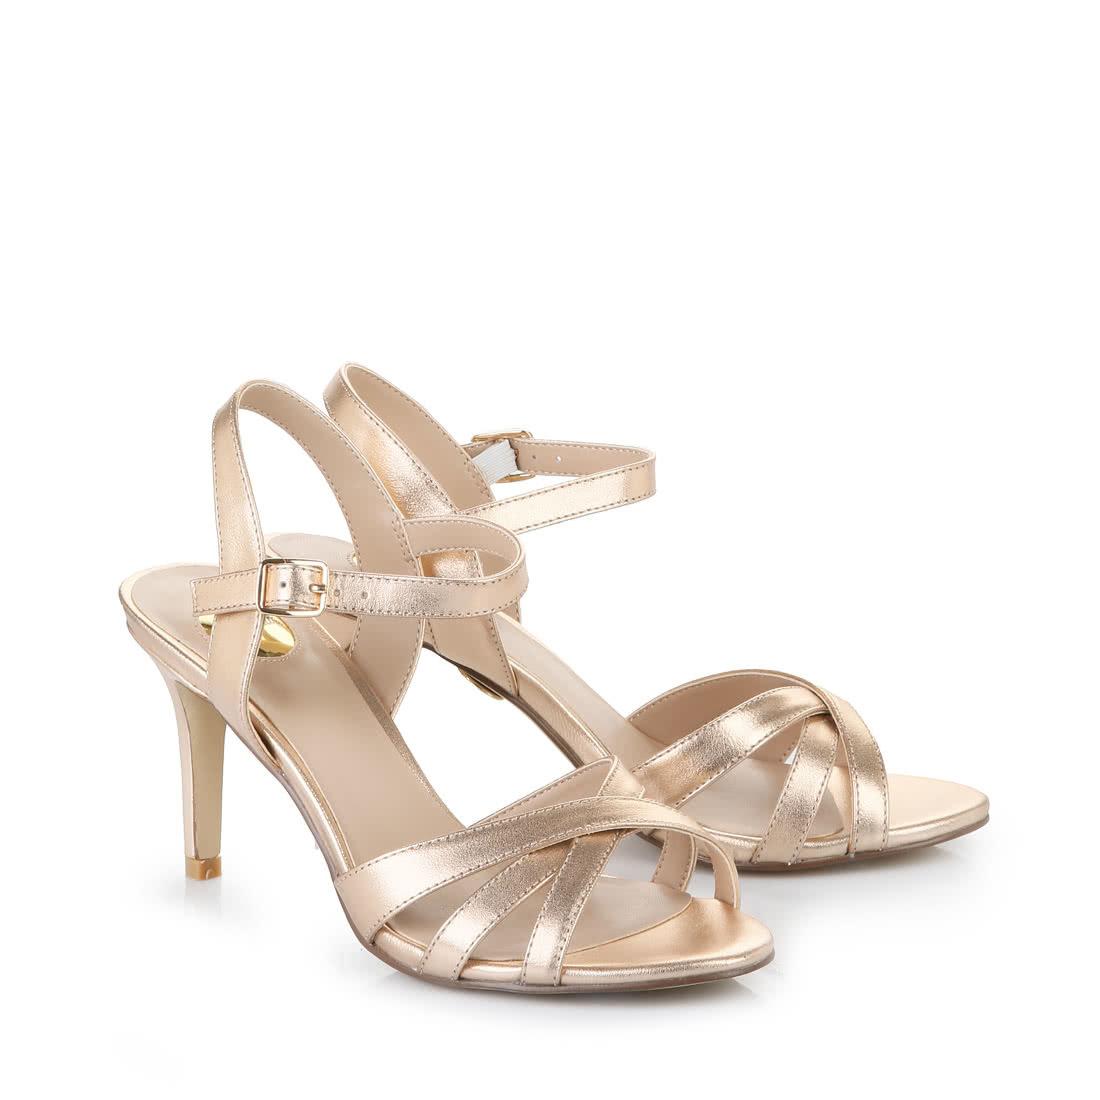 7c0ac4a273 Buffalo high-heeled sandals in bronze buy online in BUFFALO Online ...